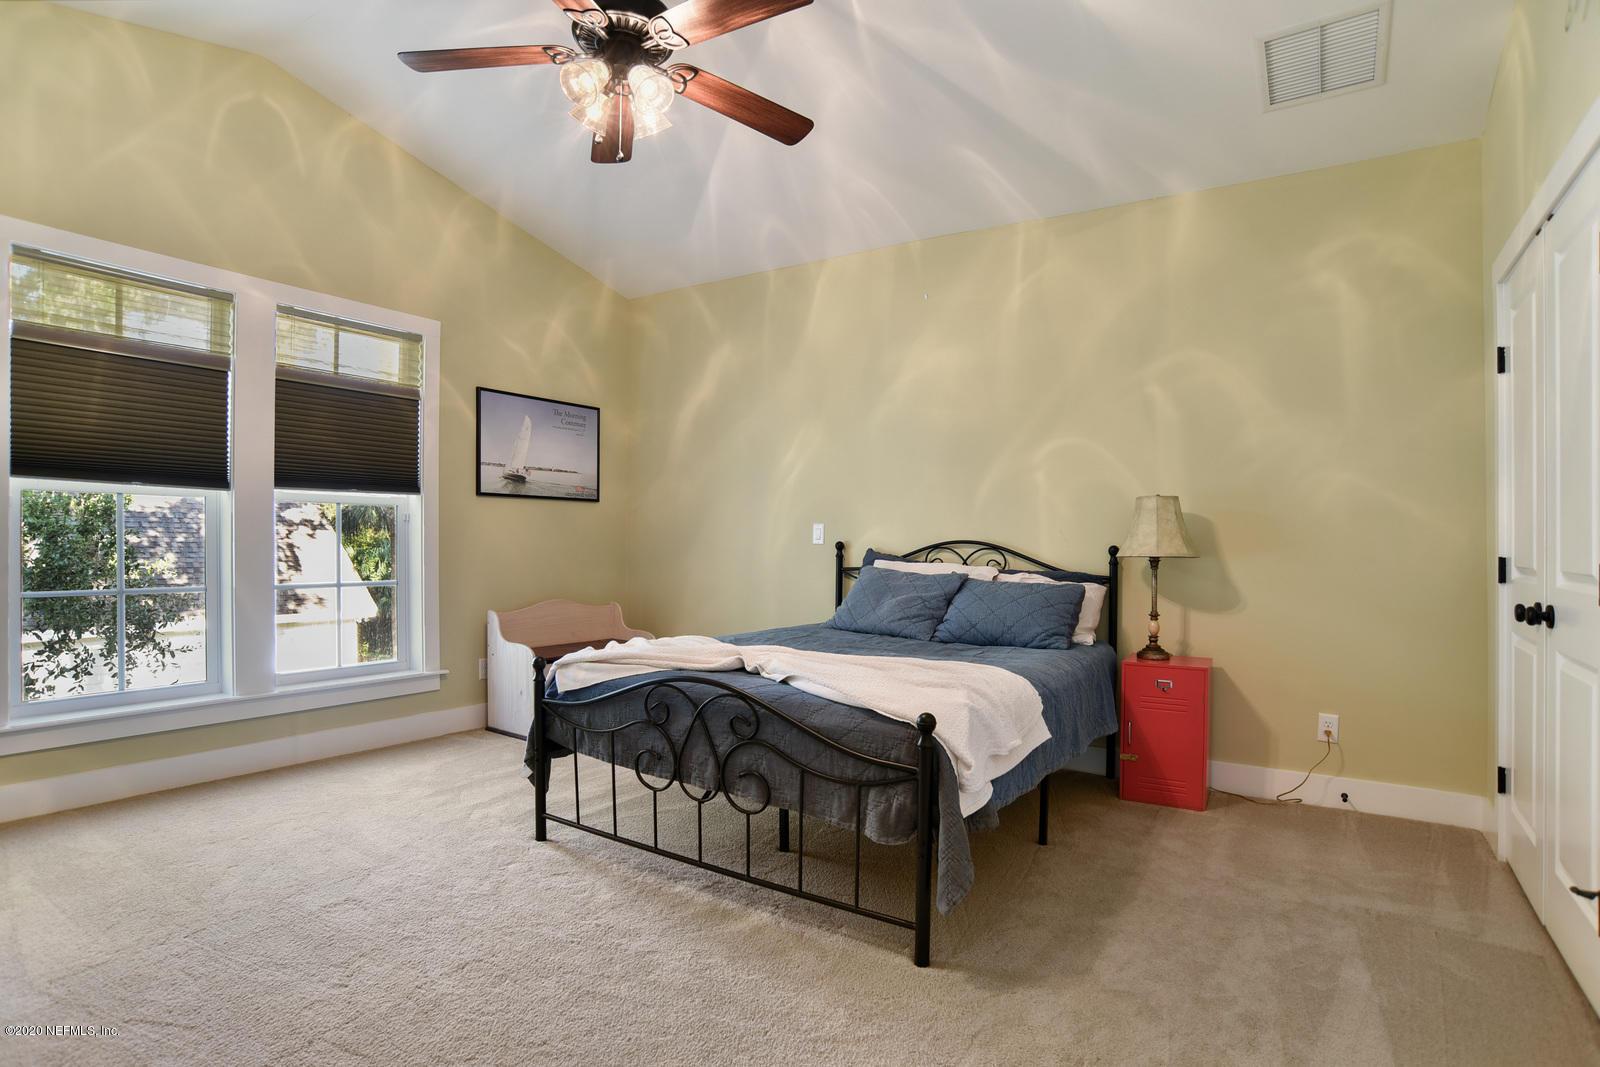 212 JEAN LAFITTE, FERNANDINA BEACH, FLORIDA 32034, 5 Bedrooms Bedrooms, ,3 BathroomsBathrooms,Residential,For sale,JEAN LAFITTE,1079991